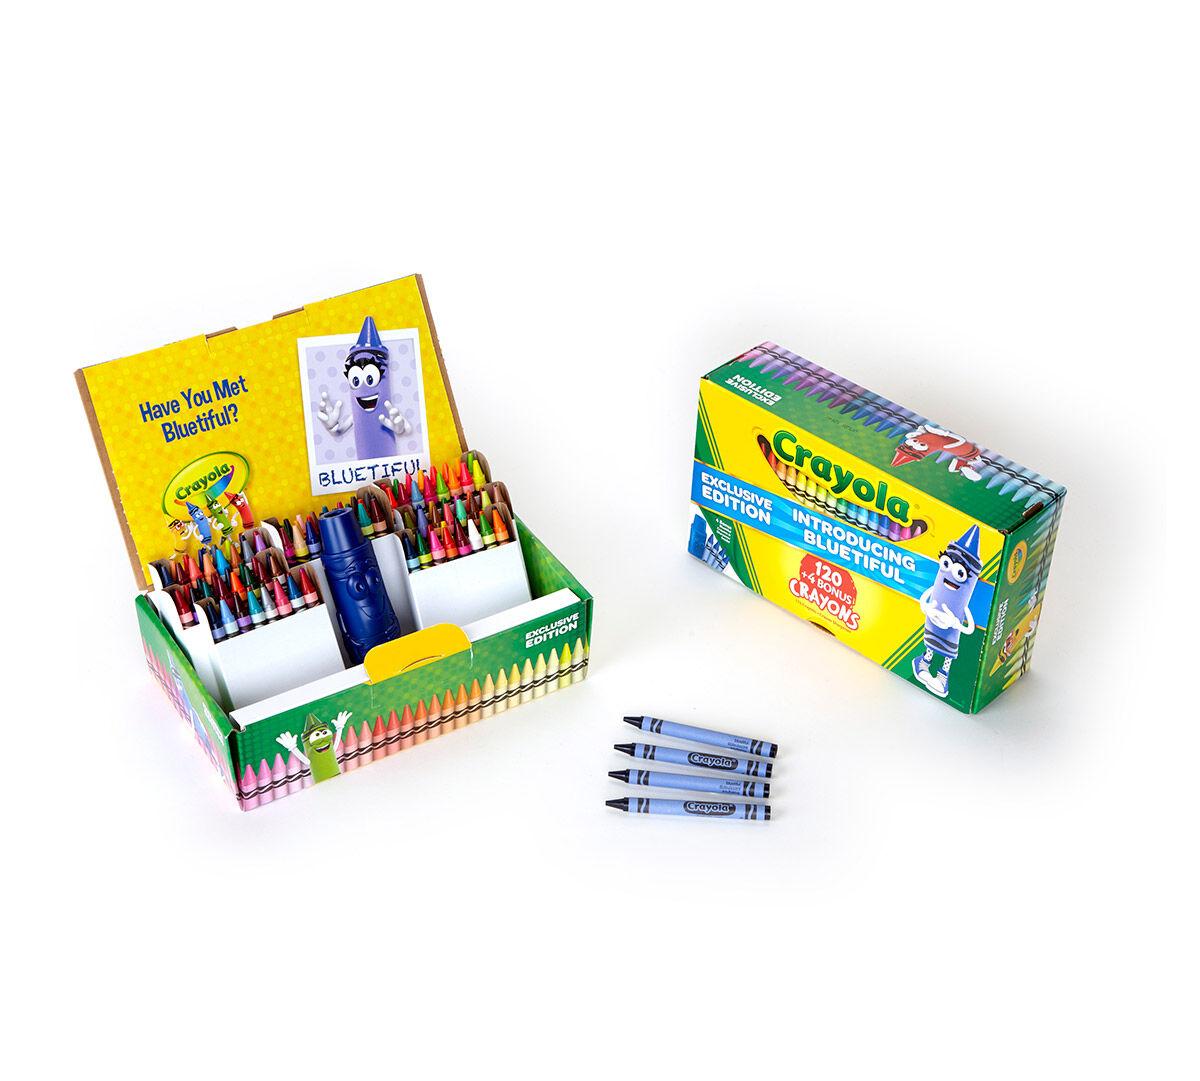 Bluetiful Crayola 124 Crayons Crayola Com